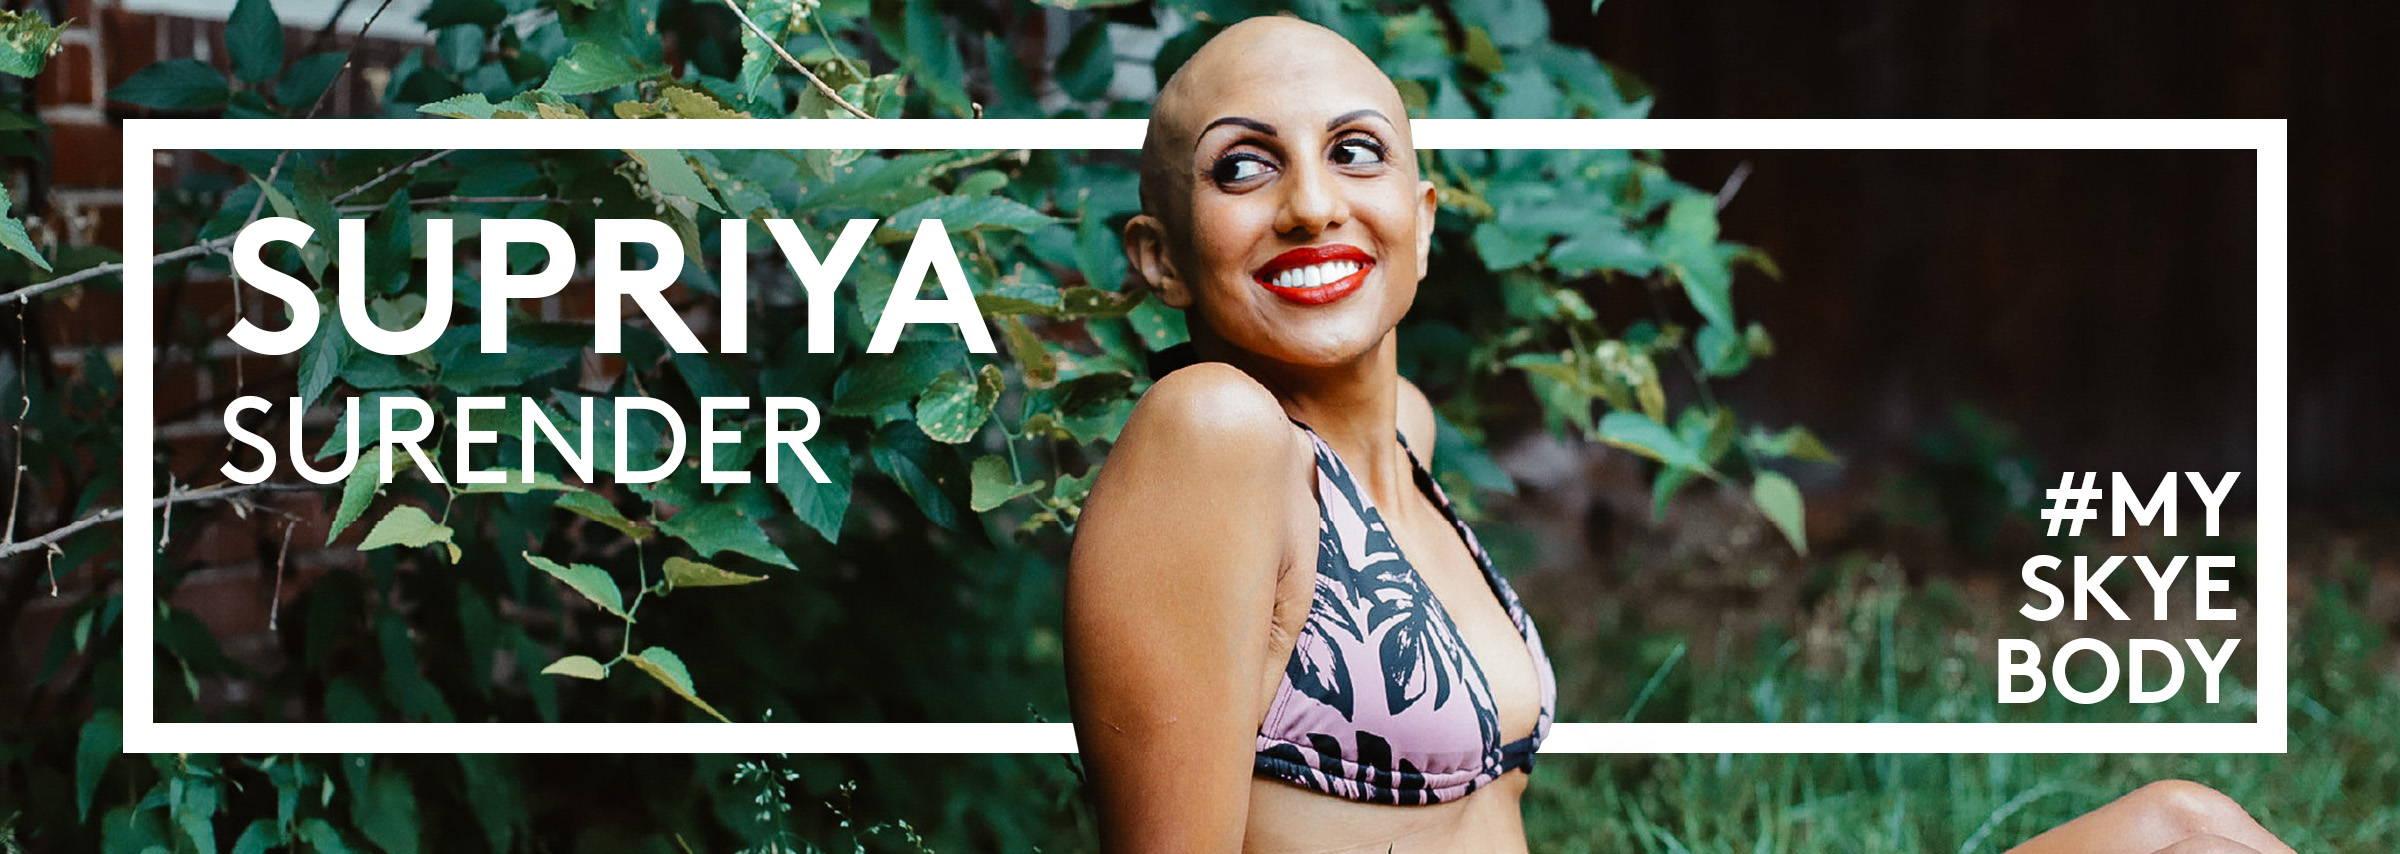 #MySkyeBody Conversation with Supriya Surender